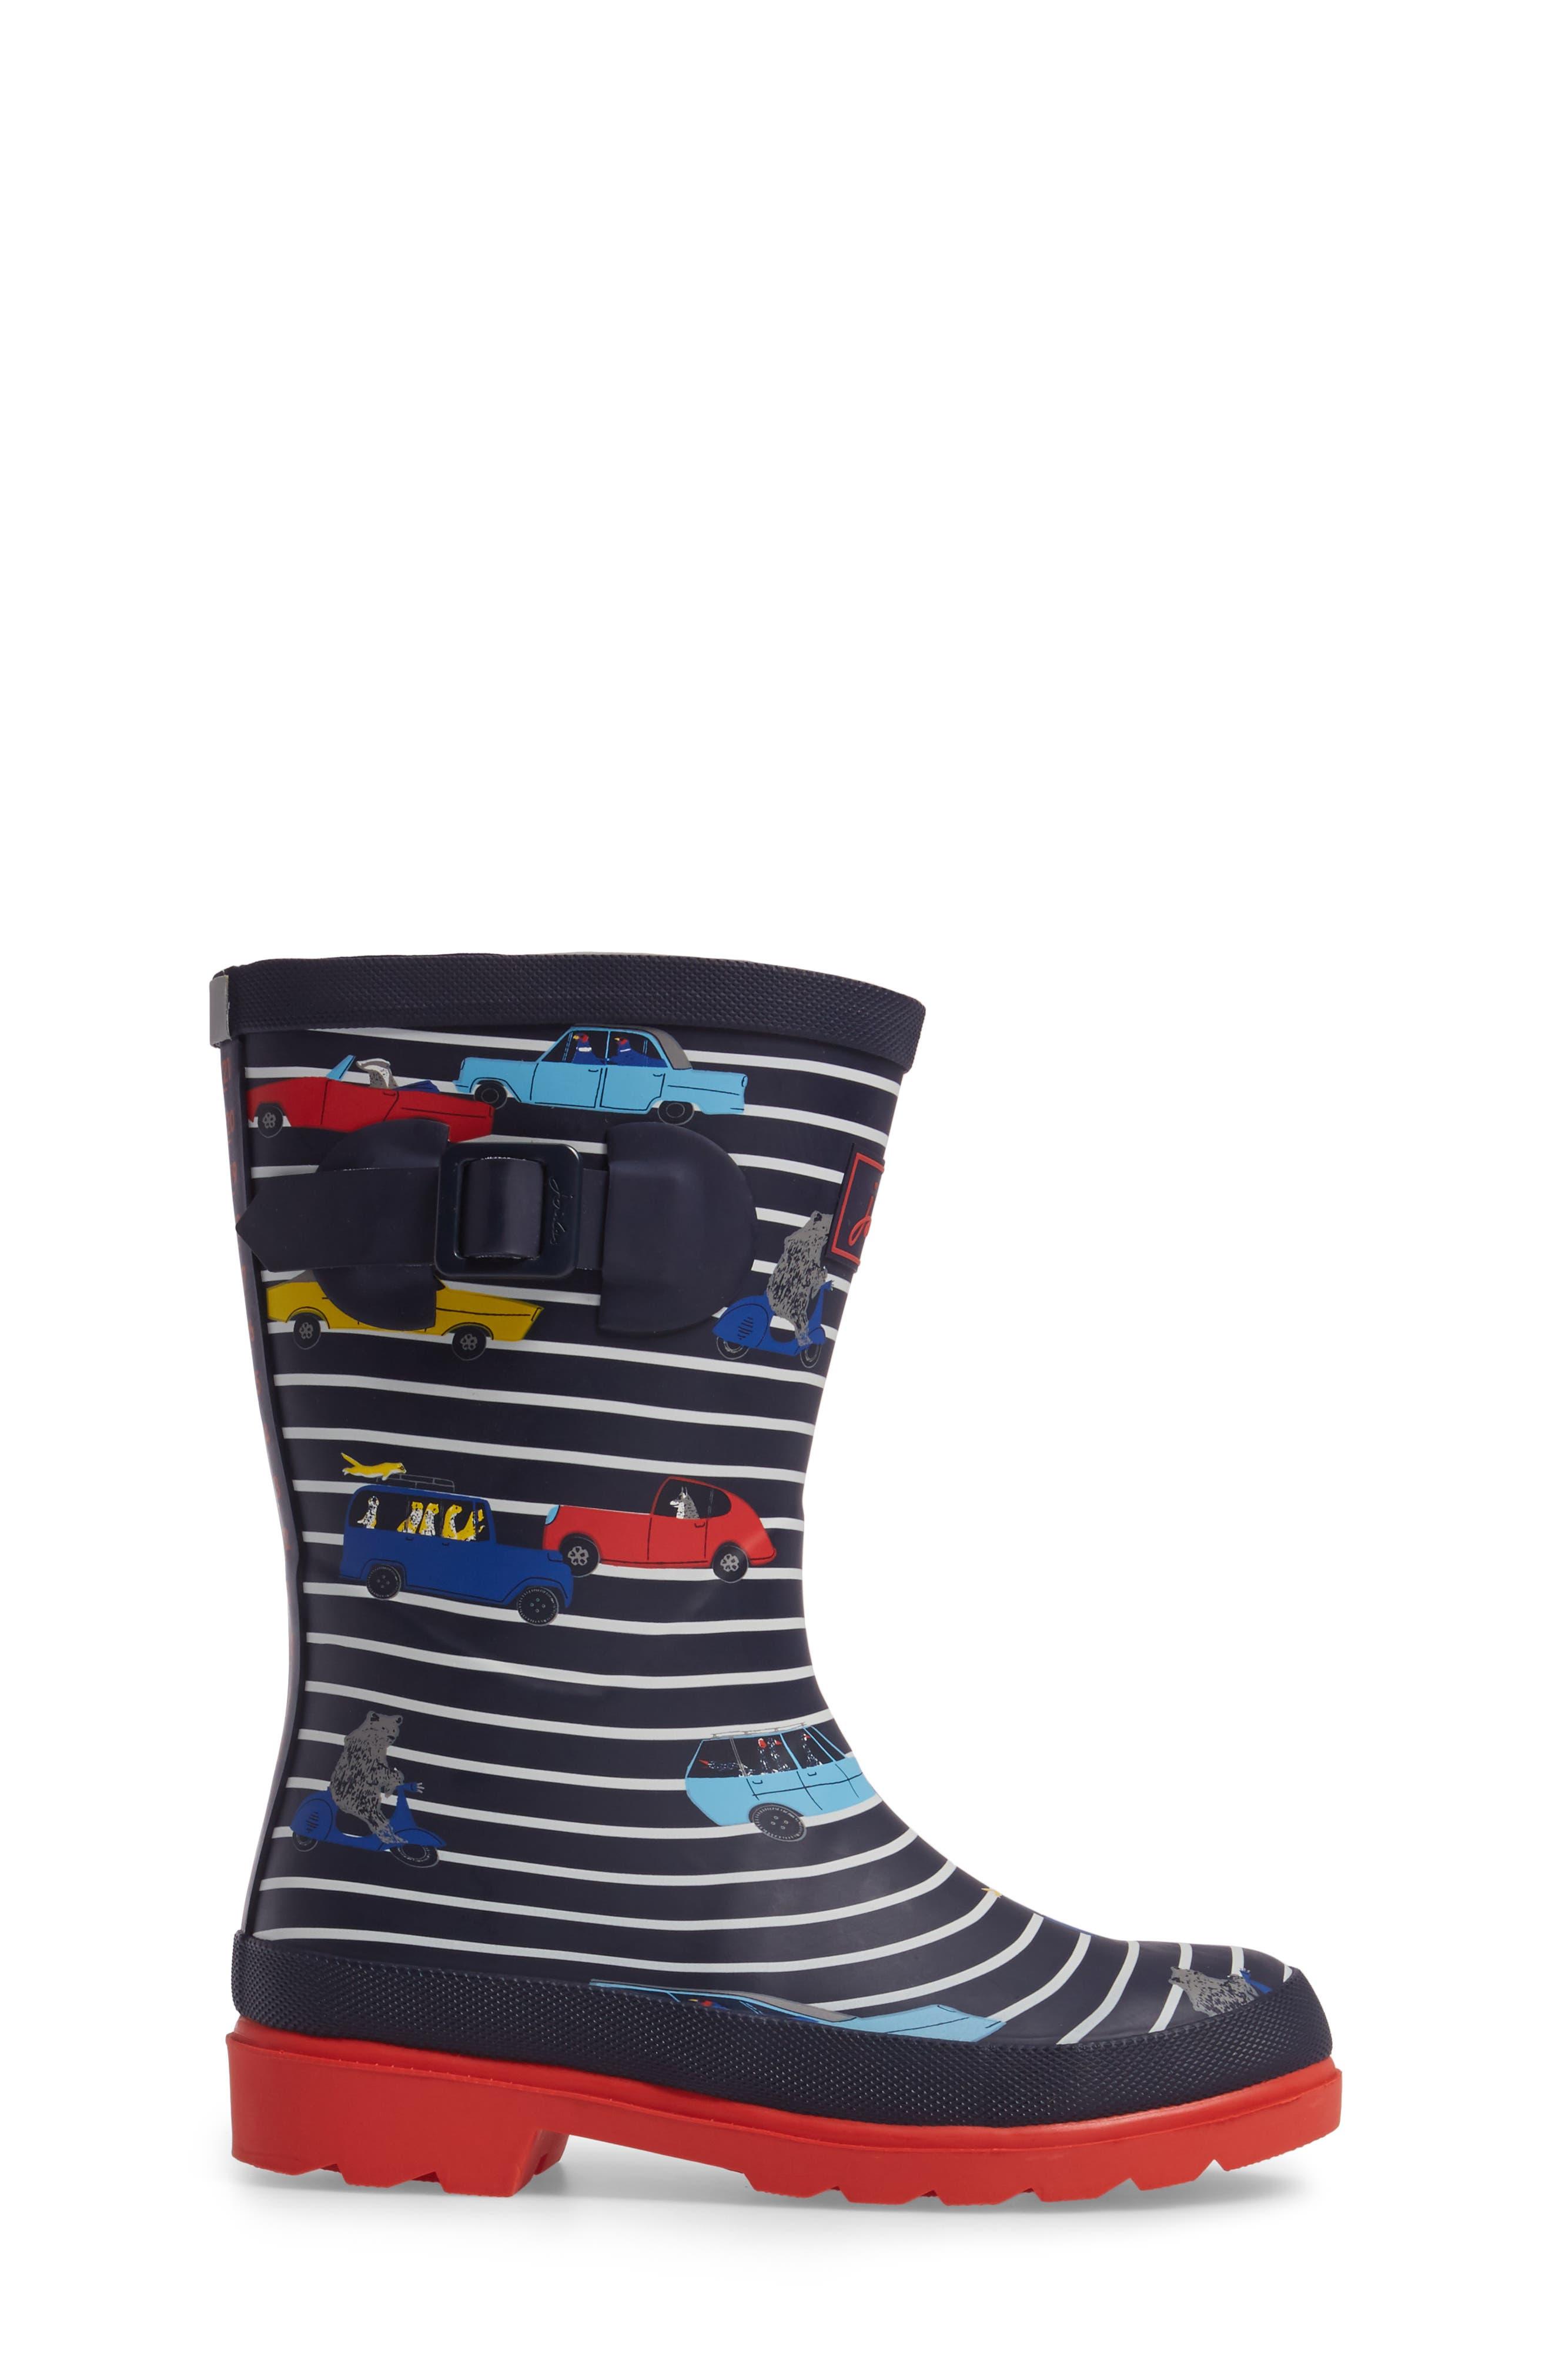 Printed Waterproof Rain Boot,                             Alternate thumbnail 3, color,                             Navy Stripe Cars